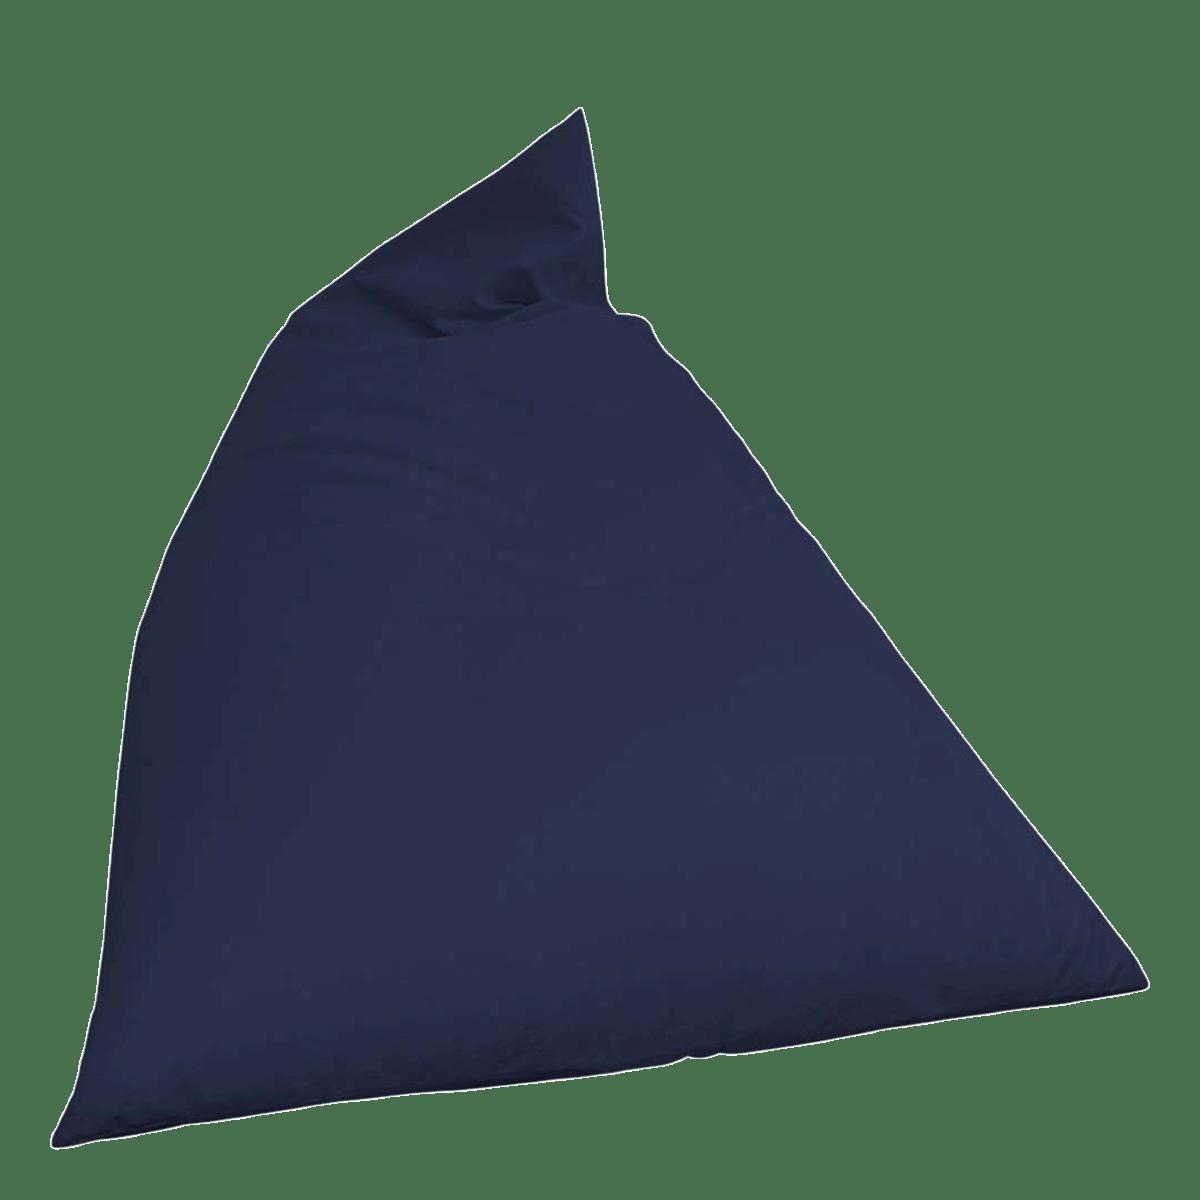 Pufe-Berlingot-124-Tecido-Lonita-Indigo-01-ok